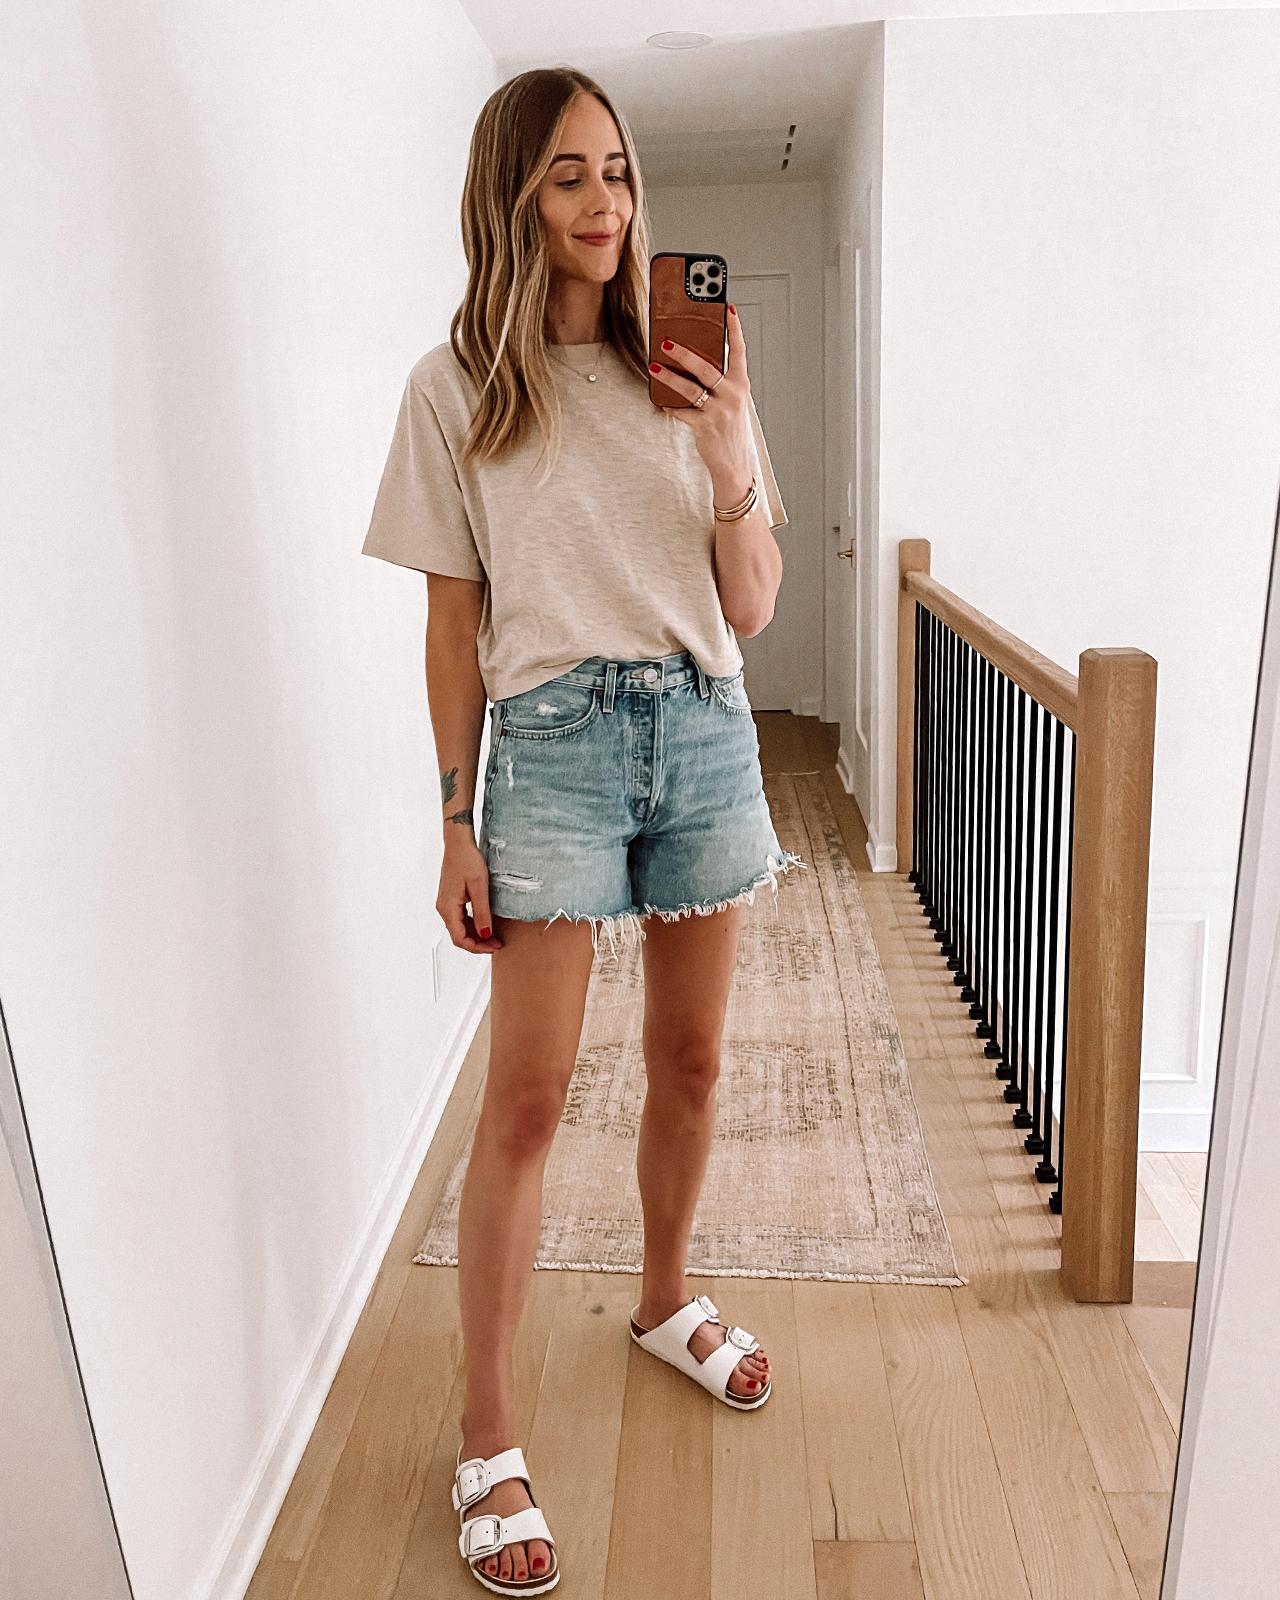 Fashion Jackson Amazon Fashion Haul Summer Beige Tshirt Denim Shorts White Birkenstock Sandals